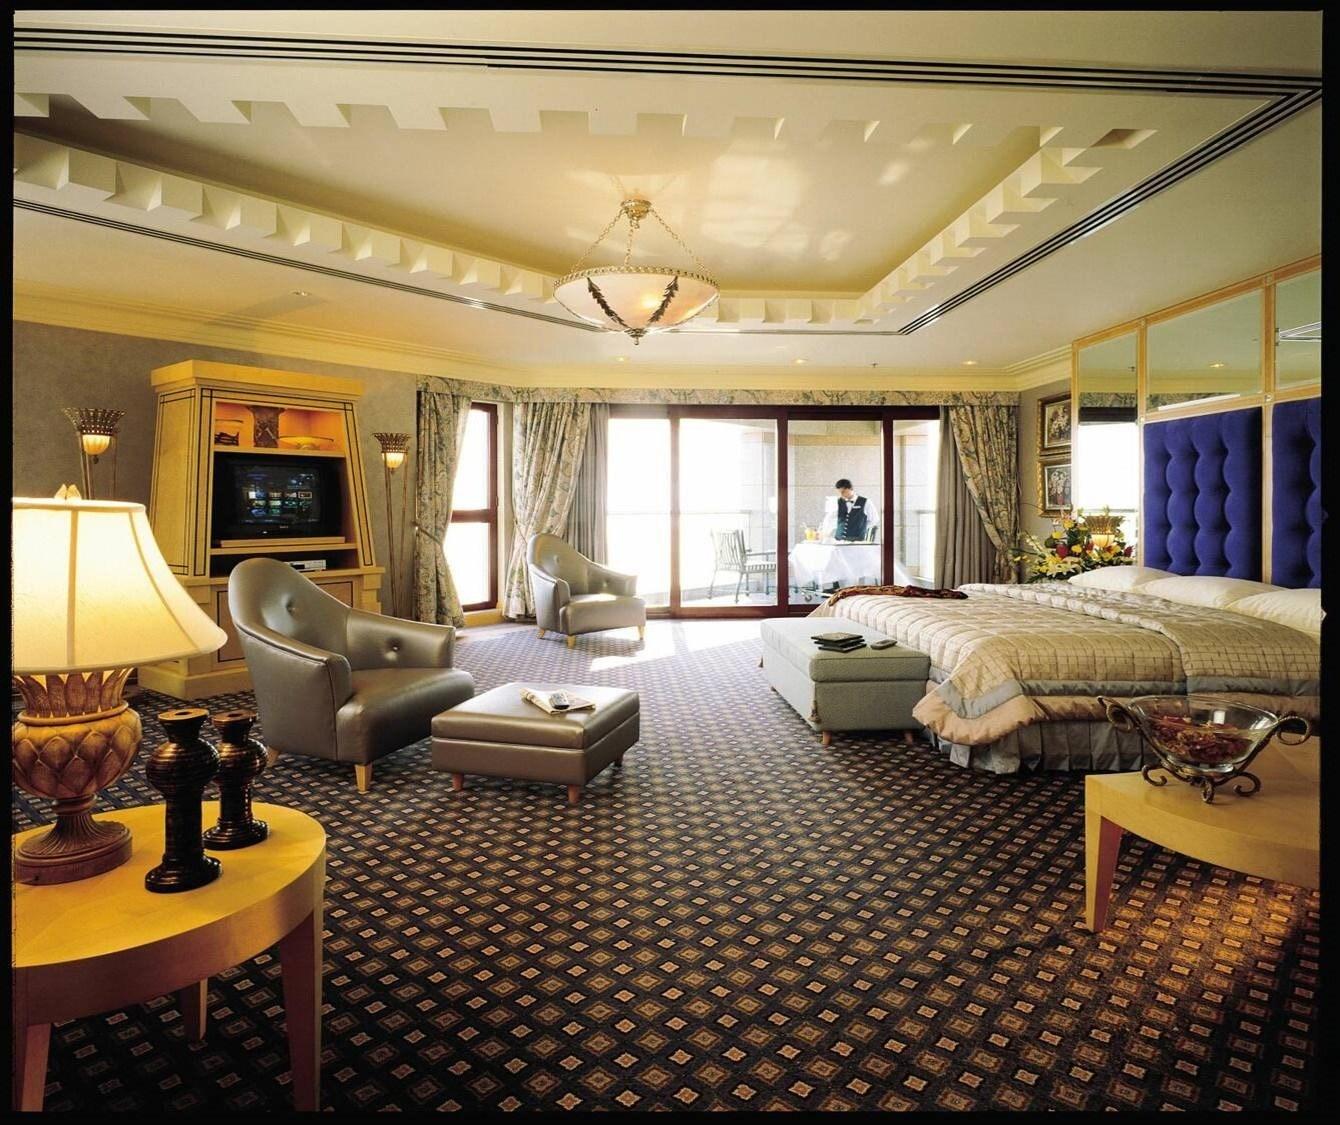 Jeddah Hilton Hotel 5 Star  Projects  Haif Company